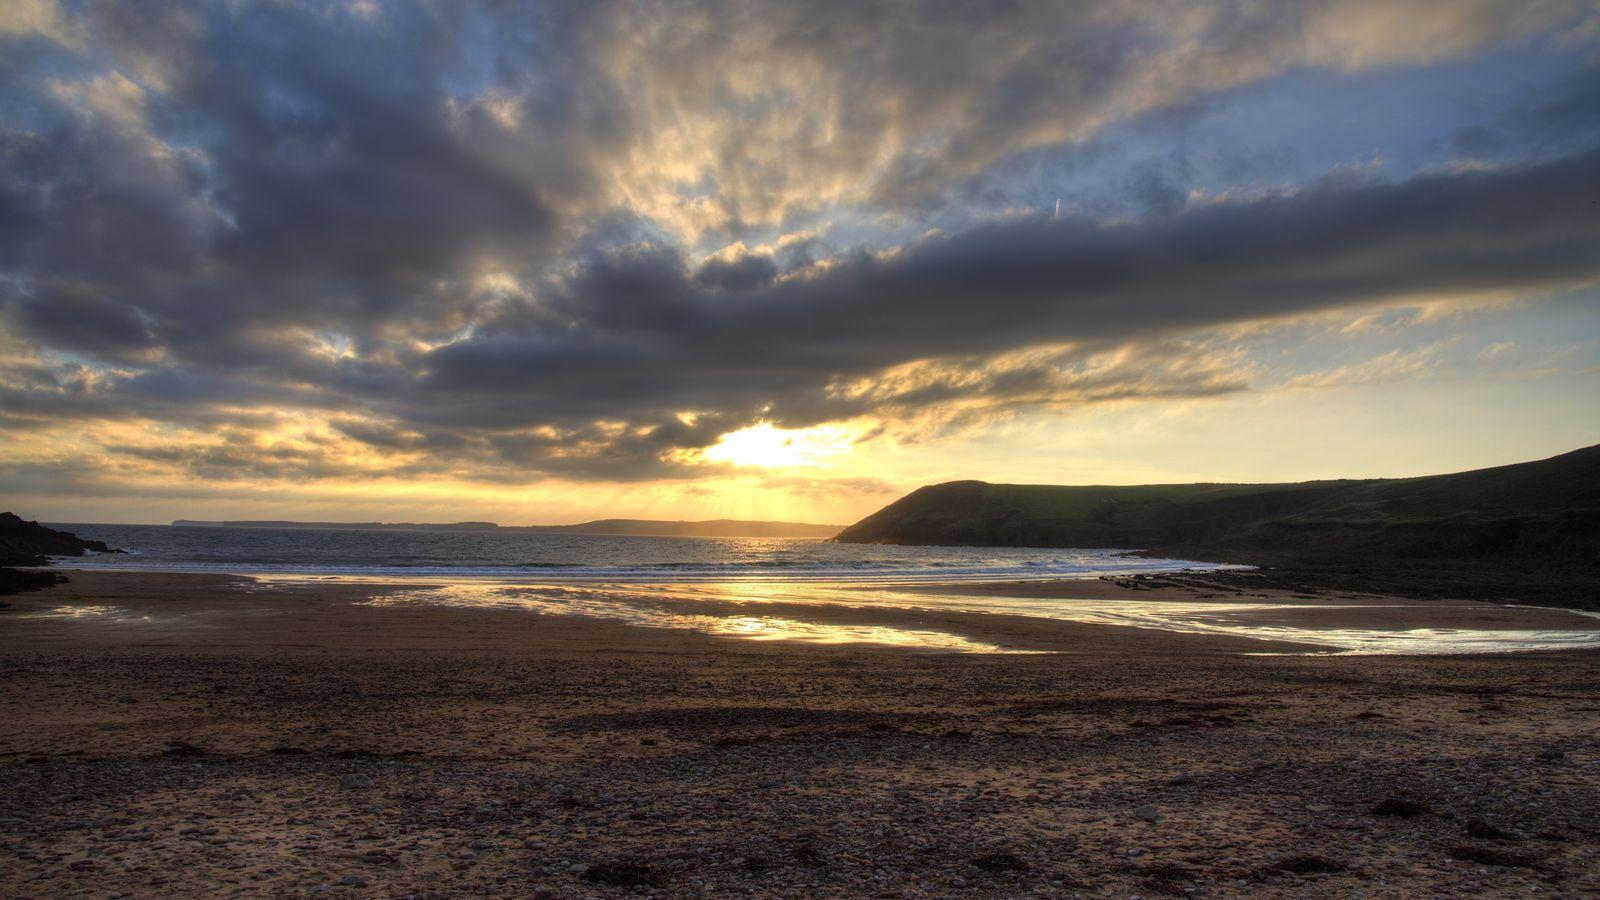 1600x900 Wallpaper shore, water, sunset, landscape